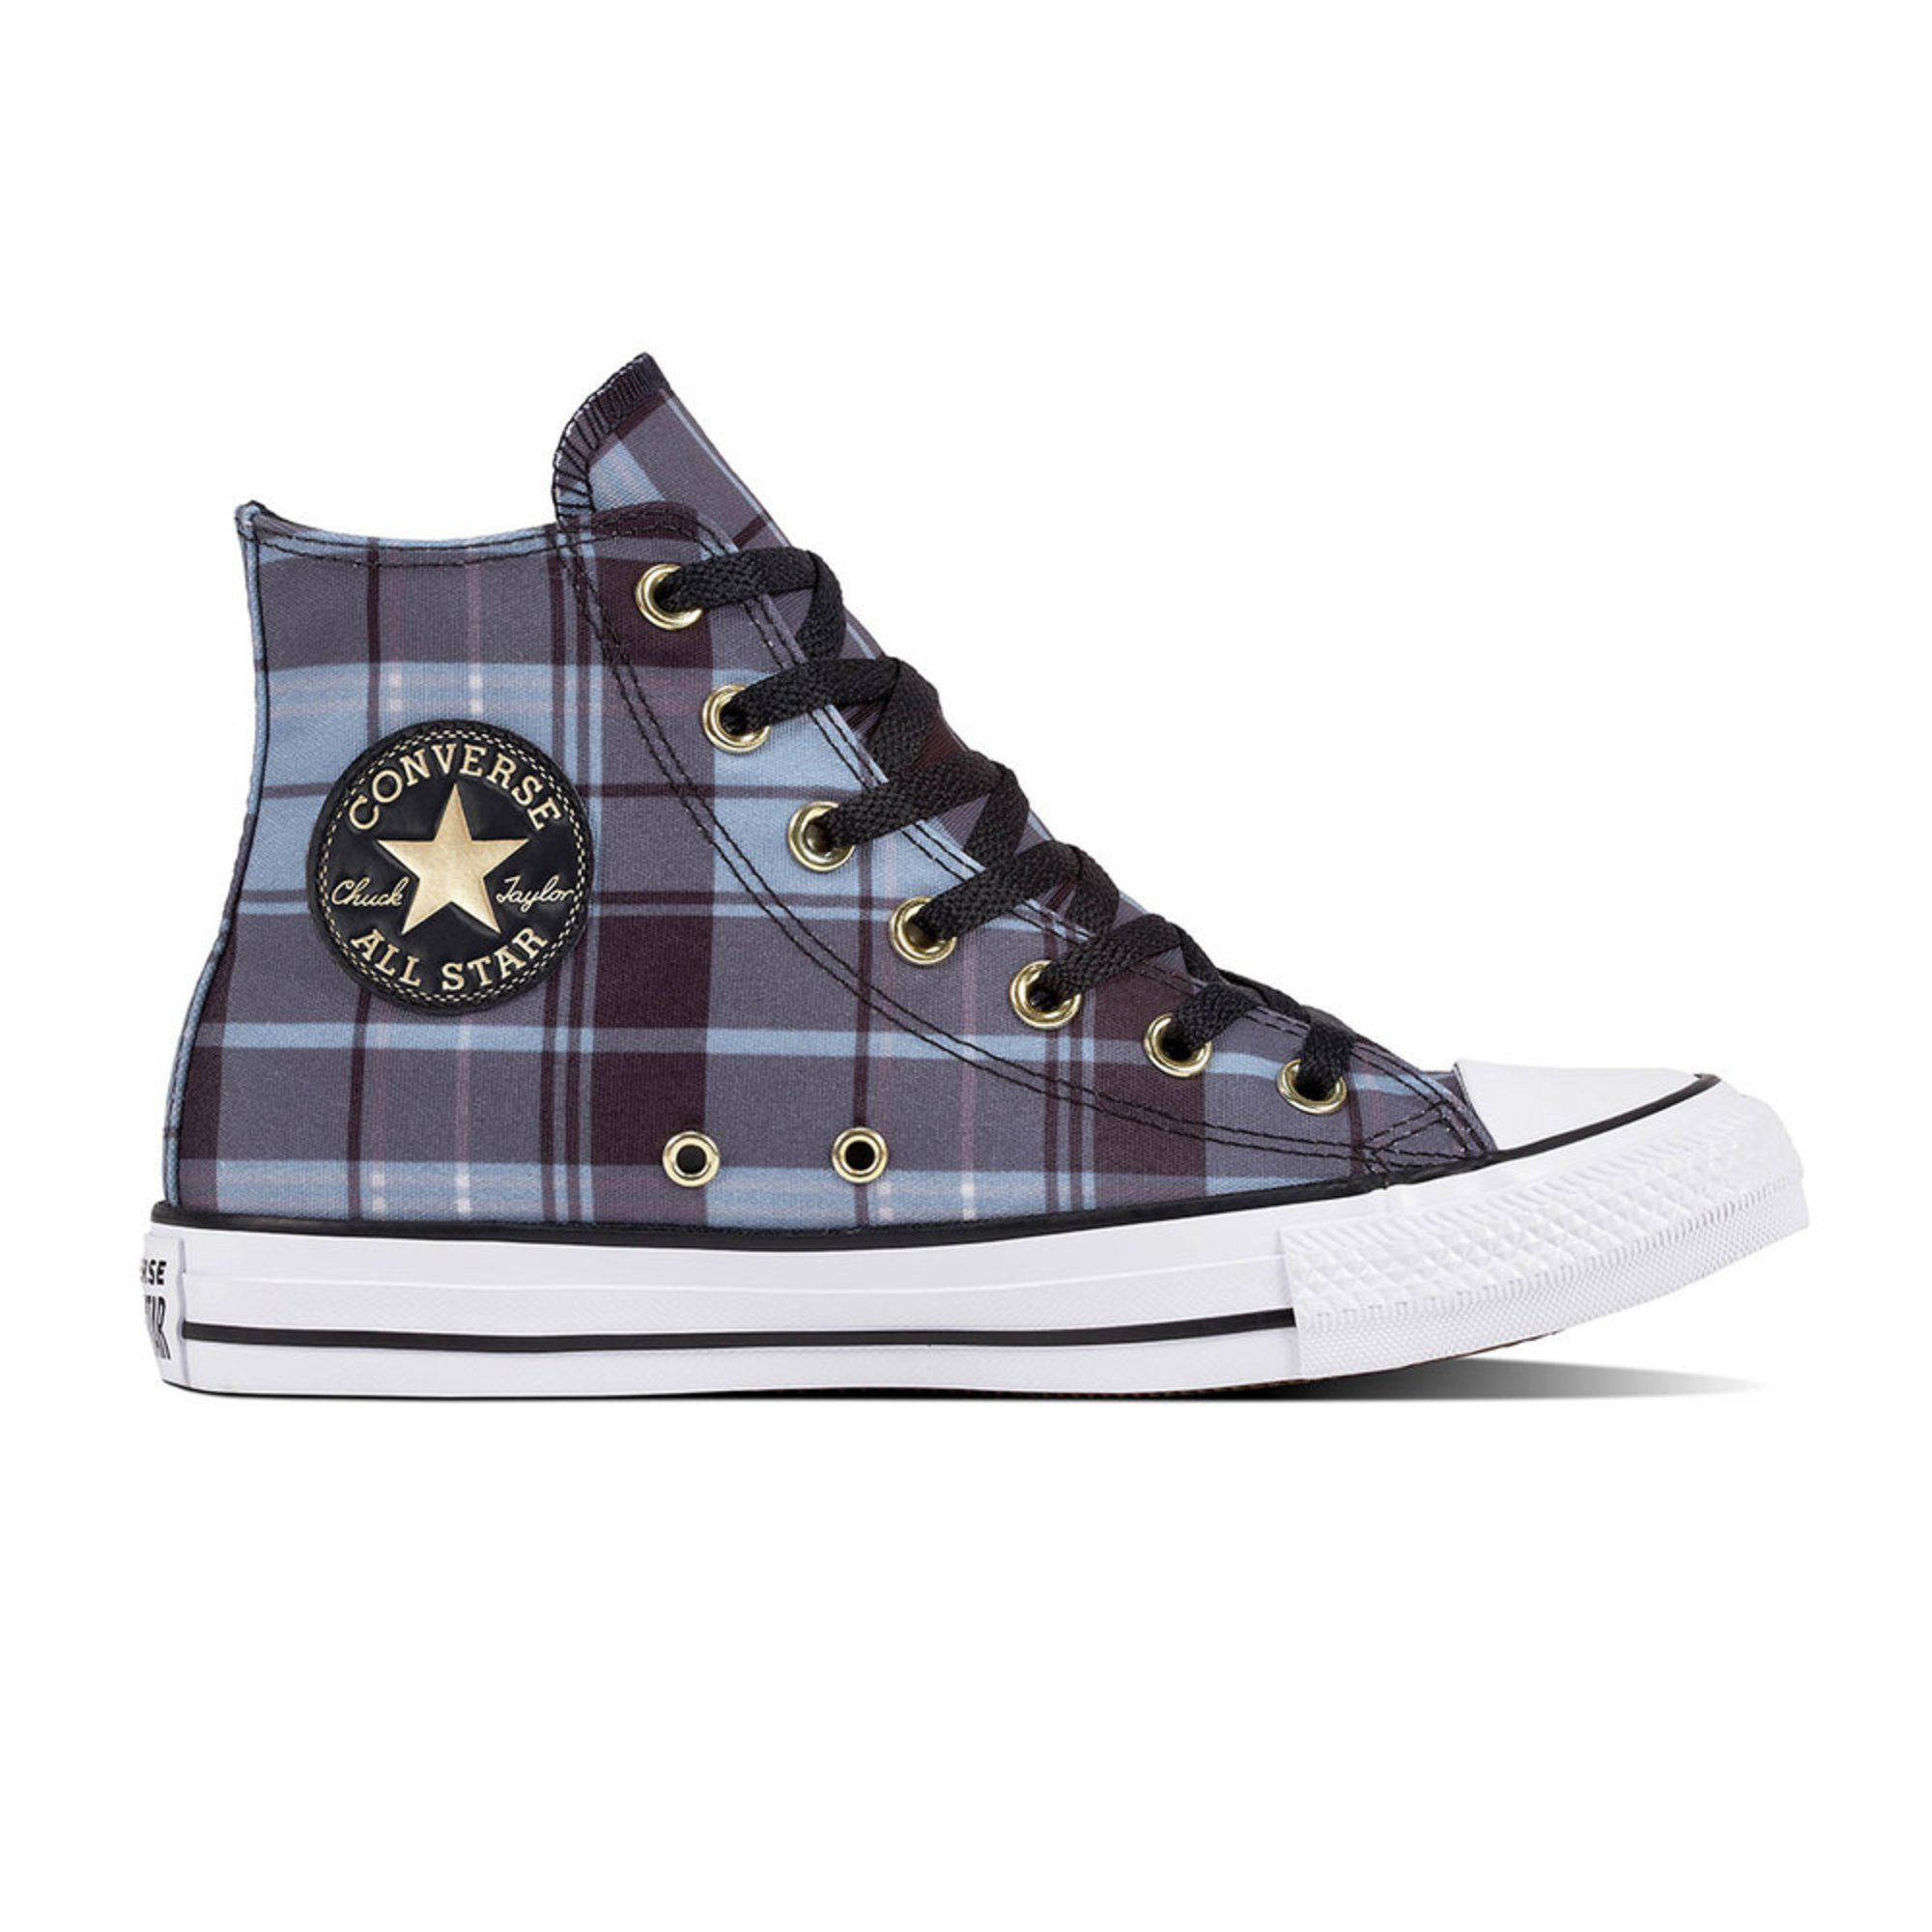 c76e145d2b4 Converse. Converse Women s Chuck Taylor All Star Hi ...